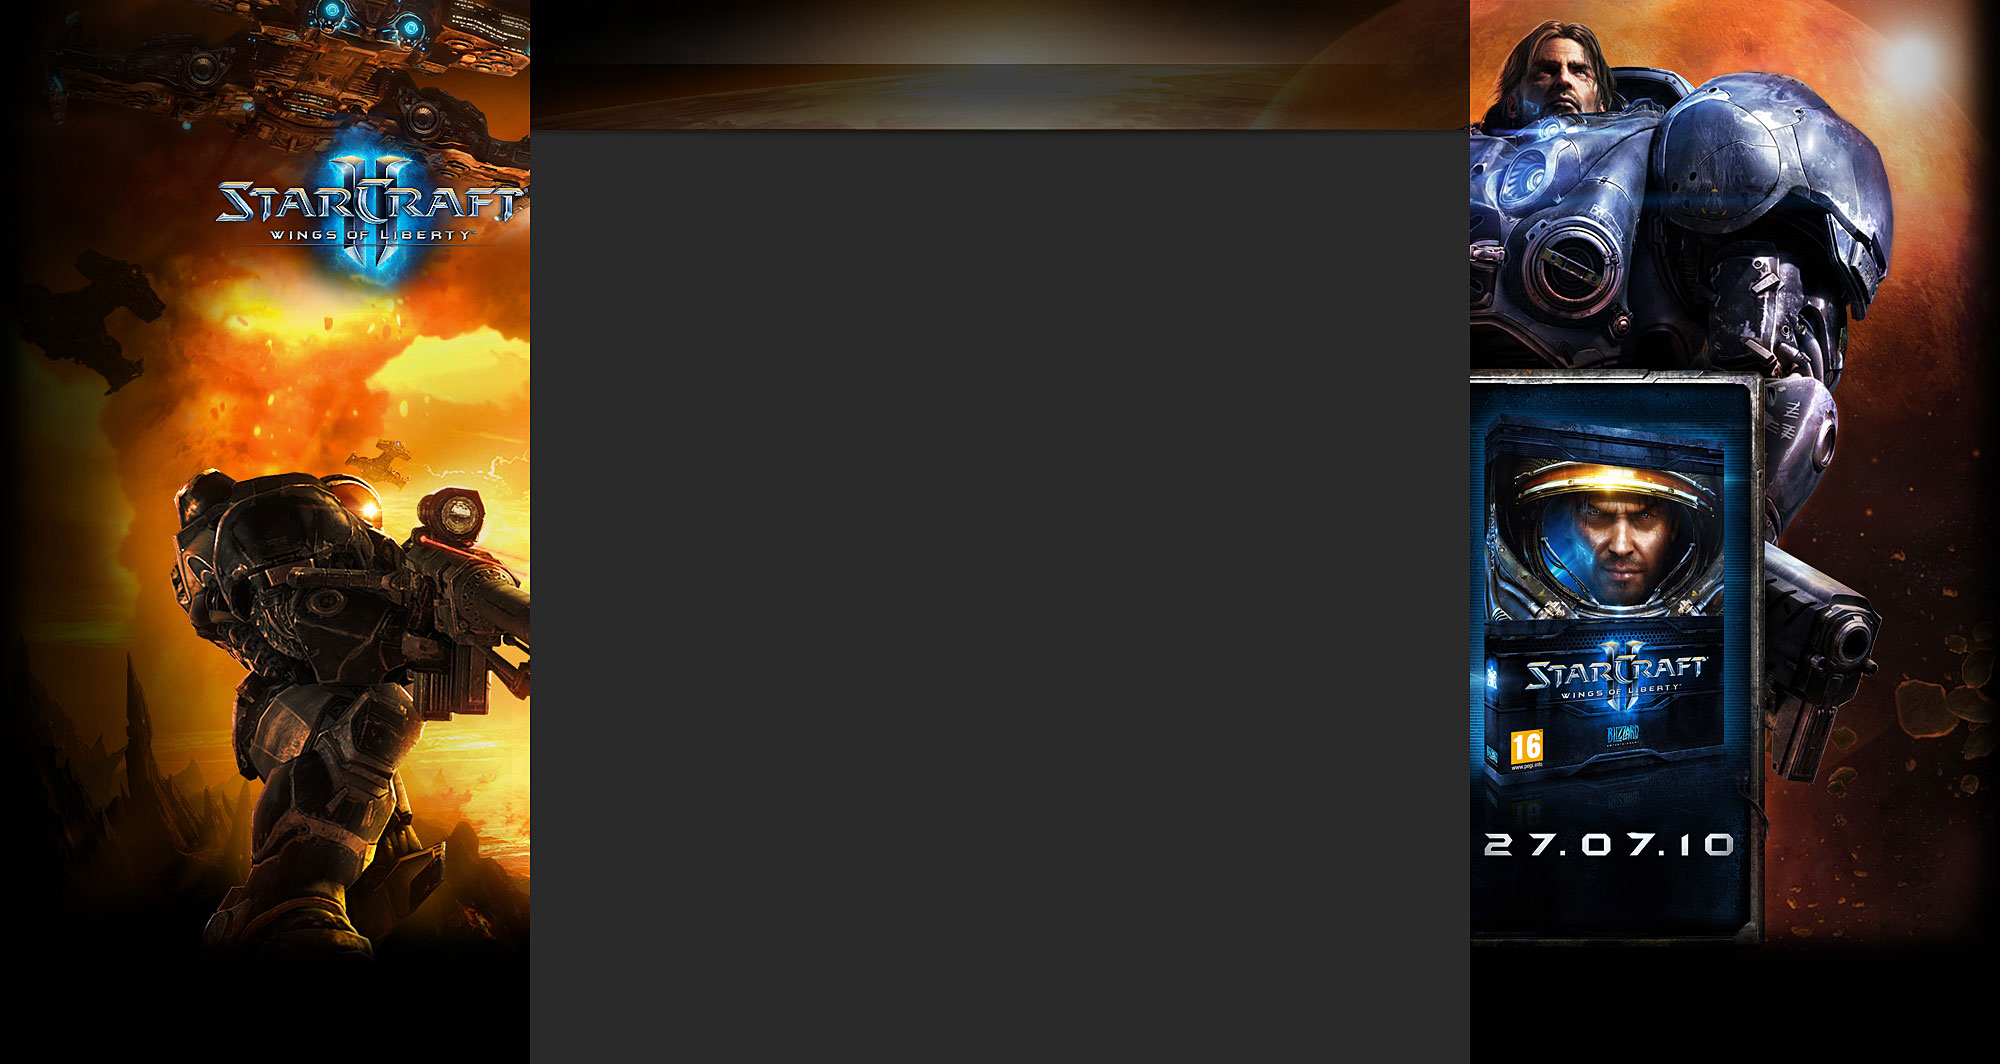 Background image dreamweaver - Starcraft2